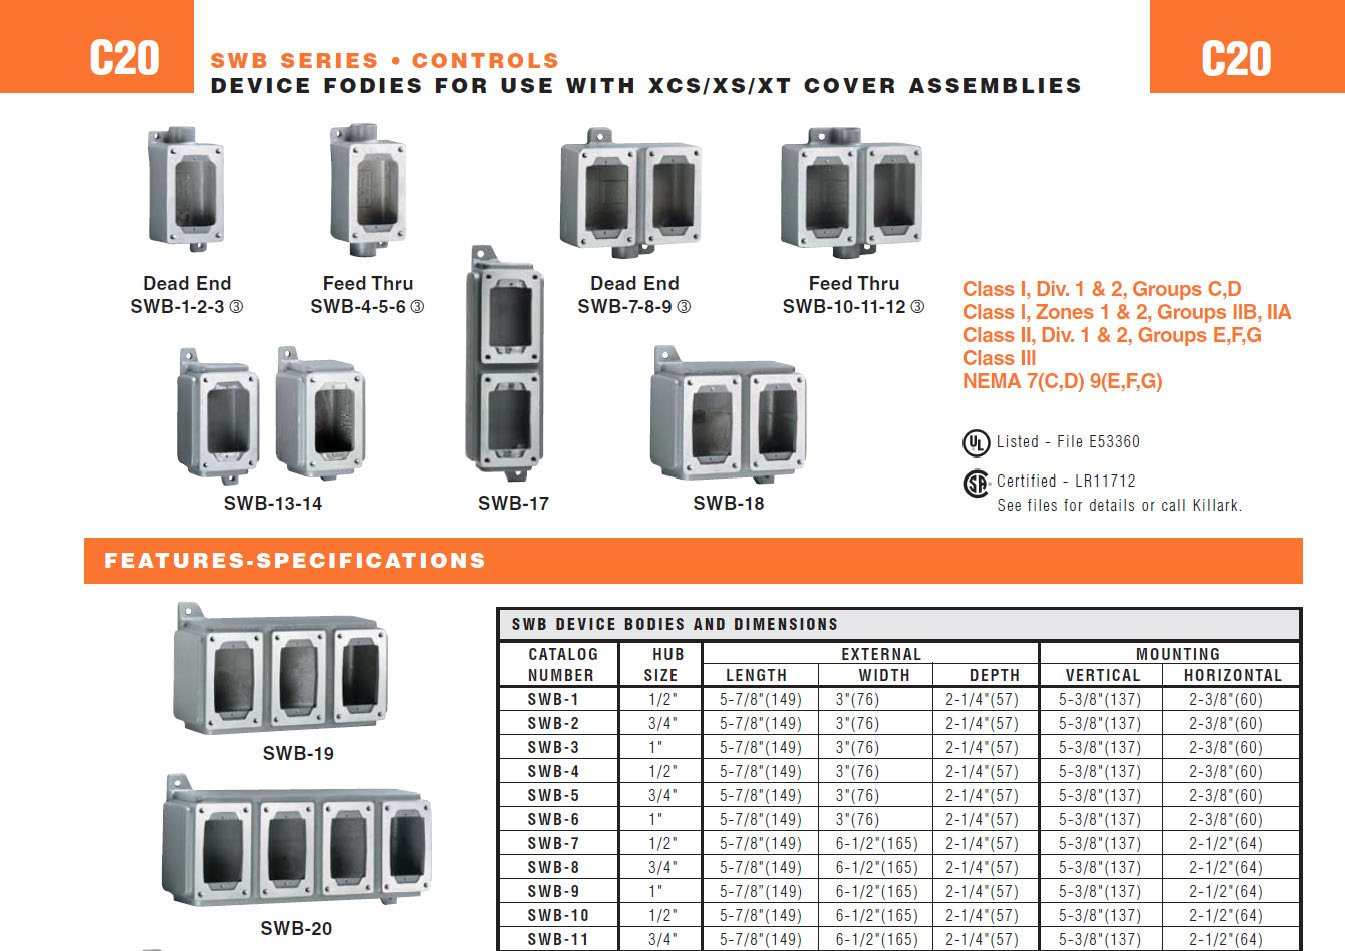 Killark SWB-5 Device Box, 3/4 Feed-Thru Hub, 1 Gang, Copper-Free Aluminum, 5-7/8 x 3 x 2-1/4 3/4 Feed-Thru Hub